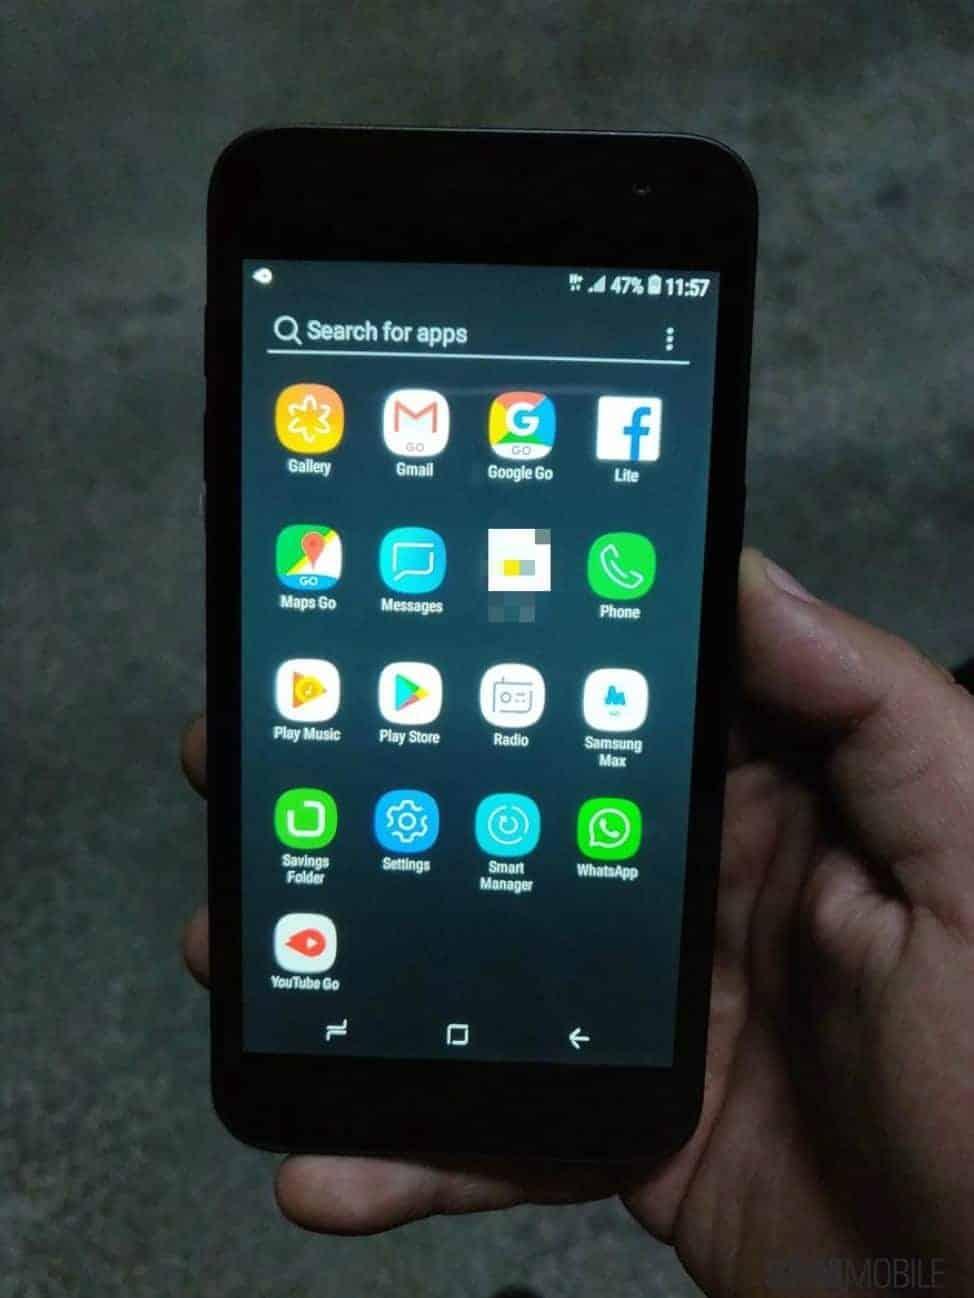 Samsung Android Go Phone SamMobile 1